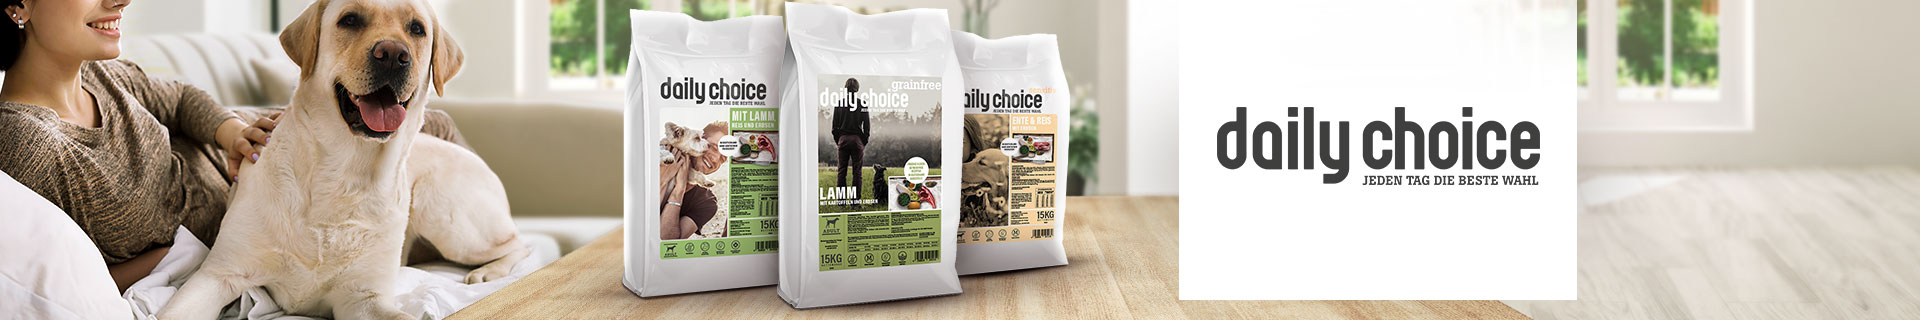 daily choice Trockenfutter für Hunde